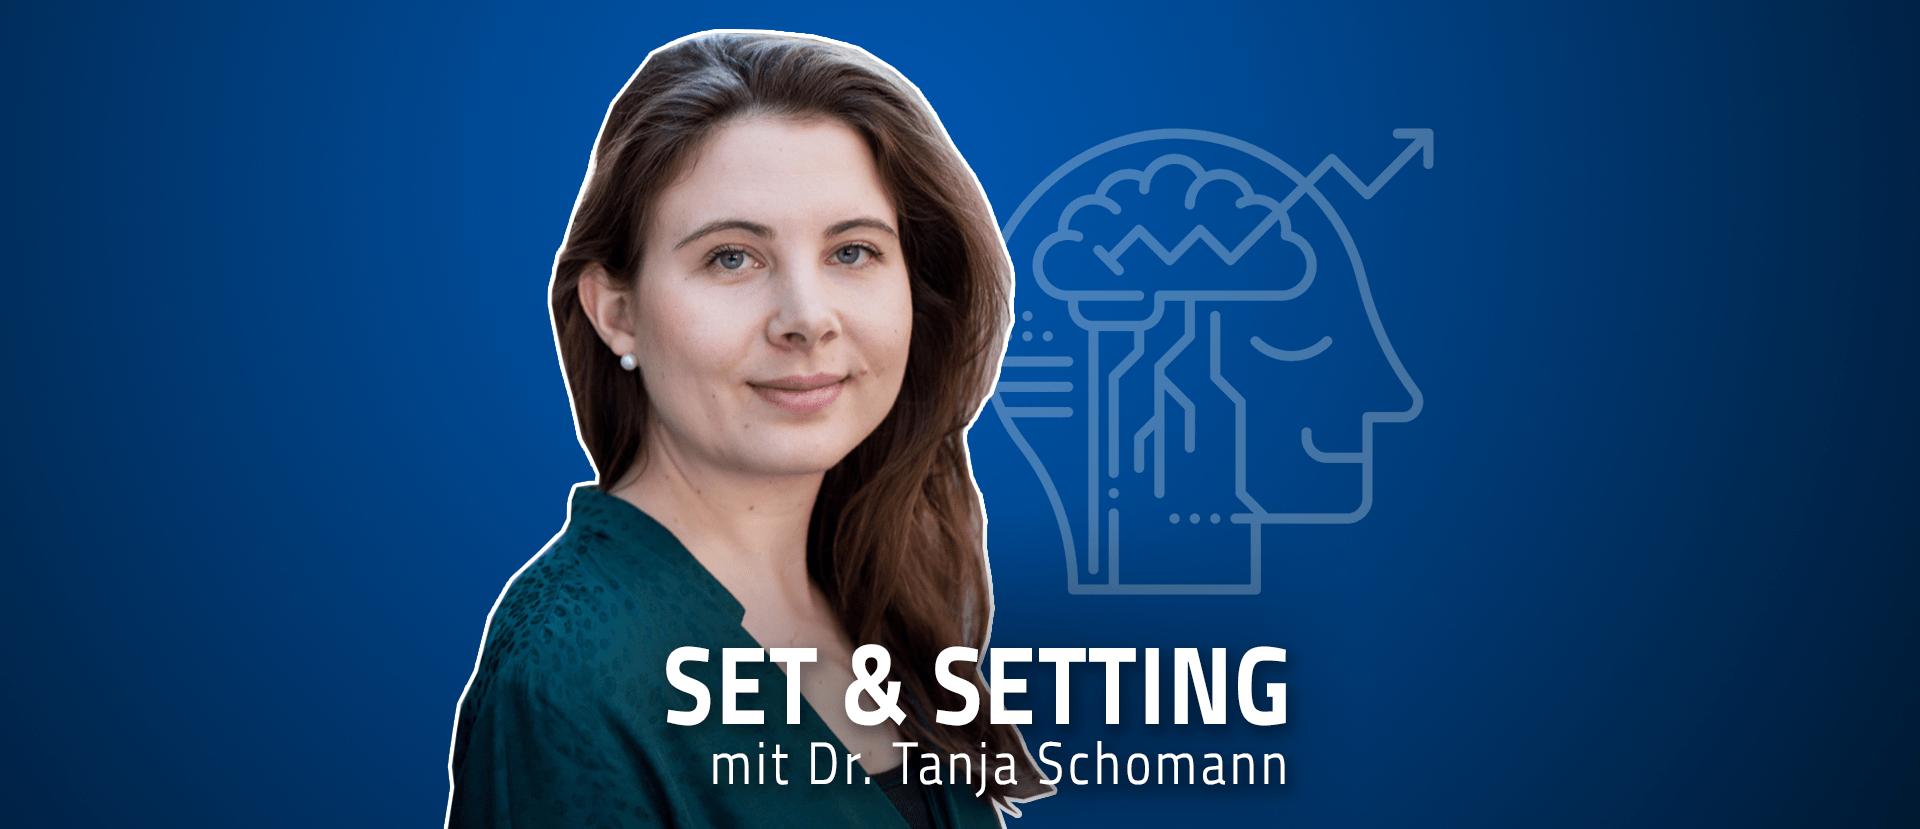 Dr. Tanja Schonmann Psychedelika Set Setting Podcast Jascha Renner